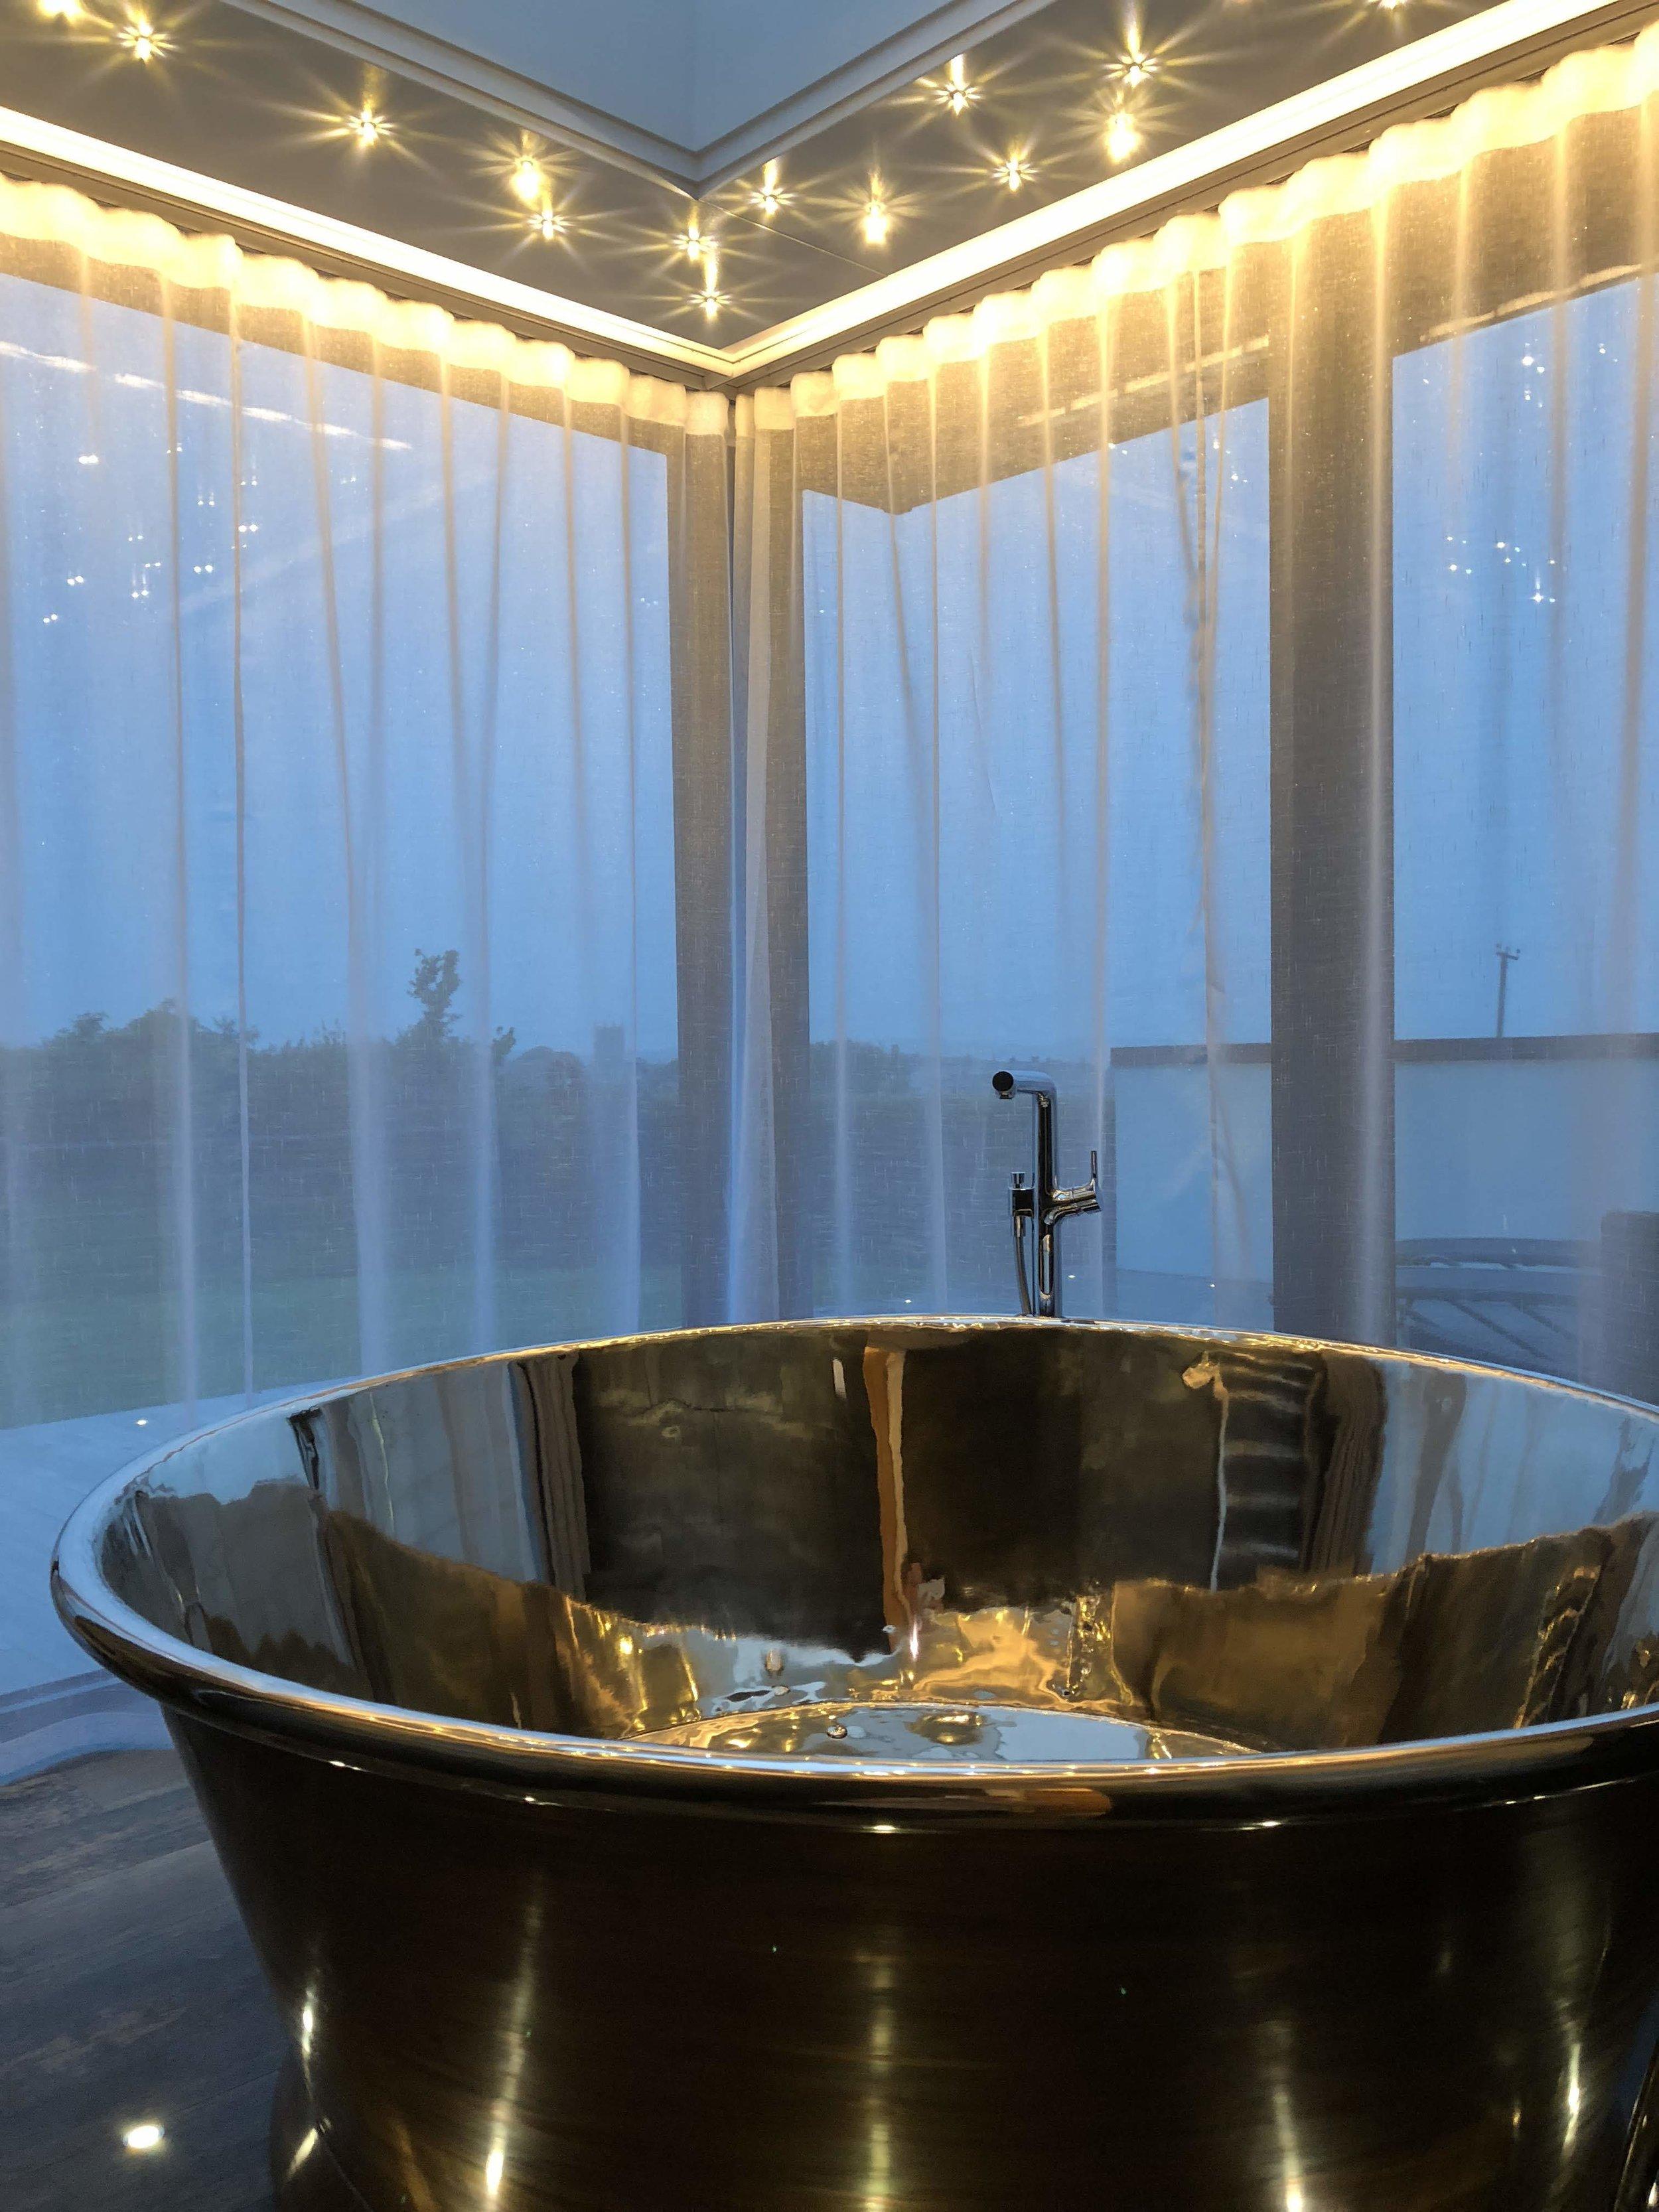 sundancer-bath-at-night-2.jpg